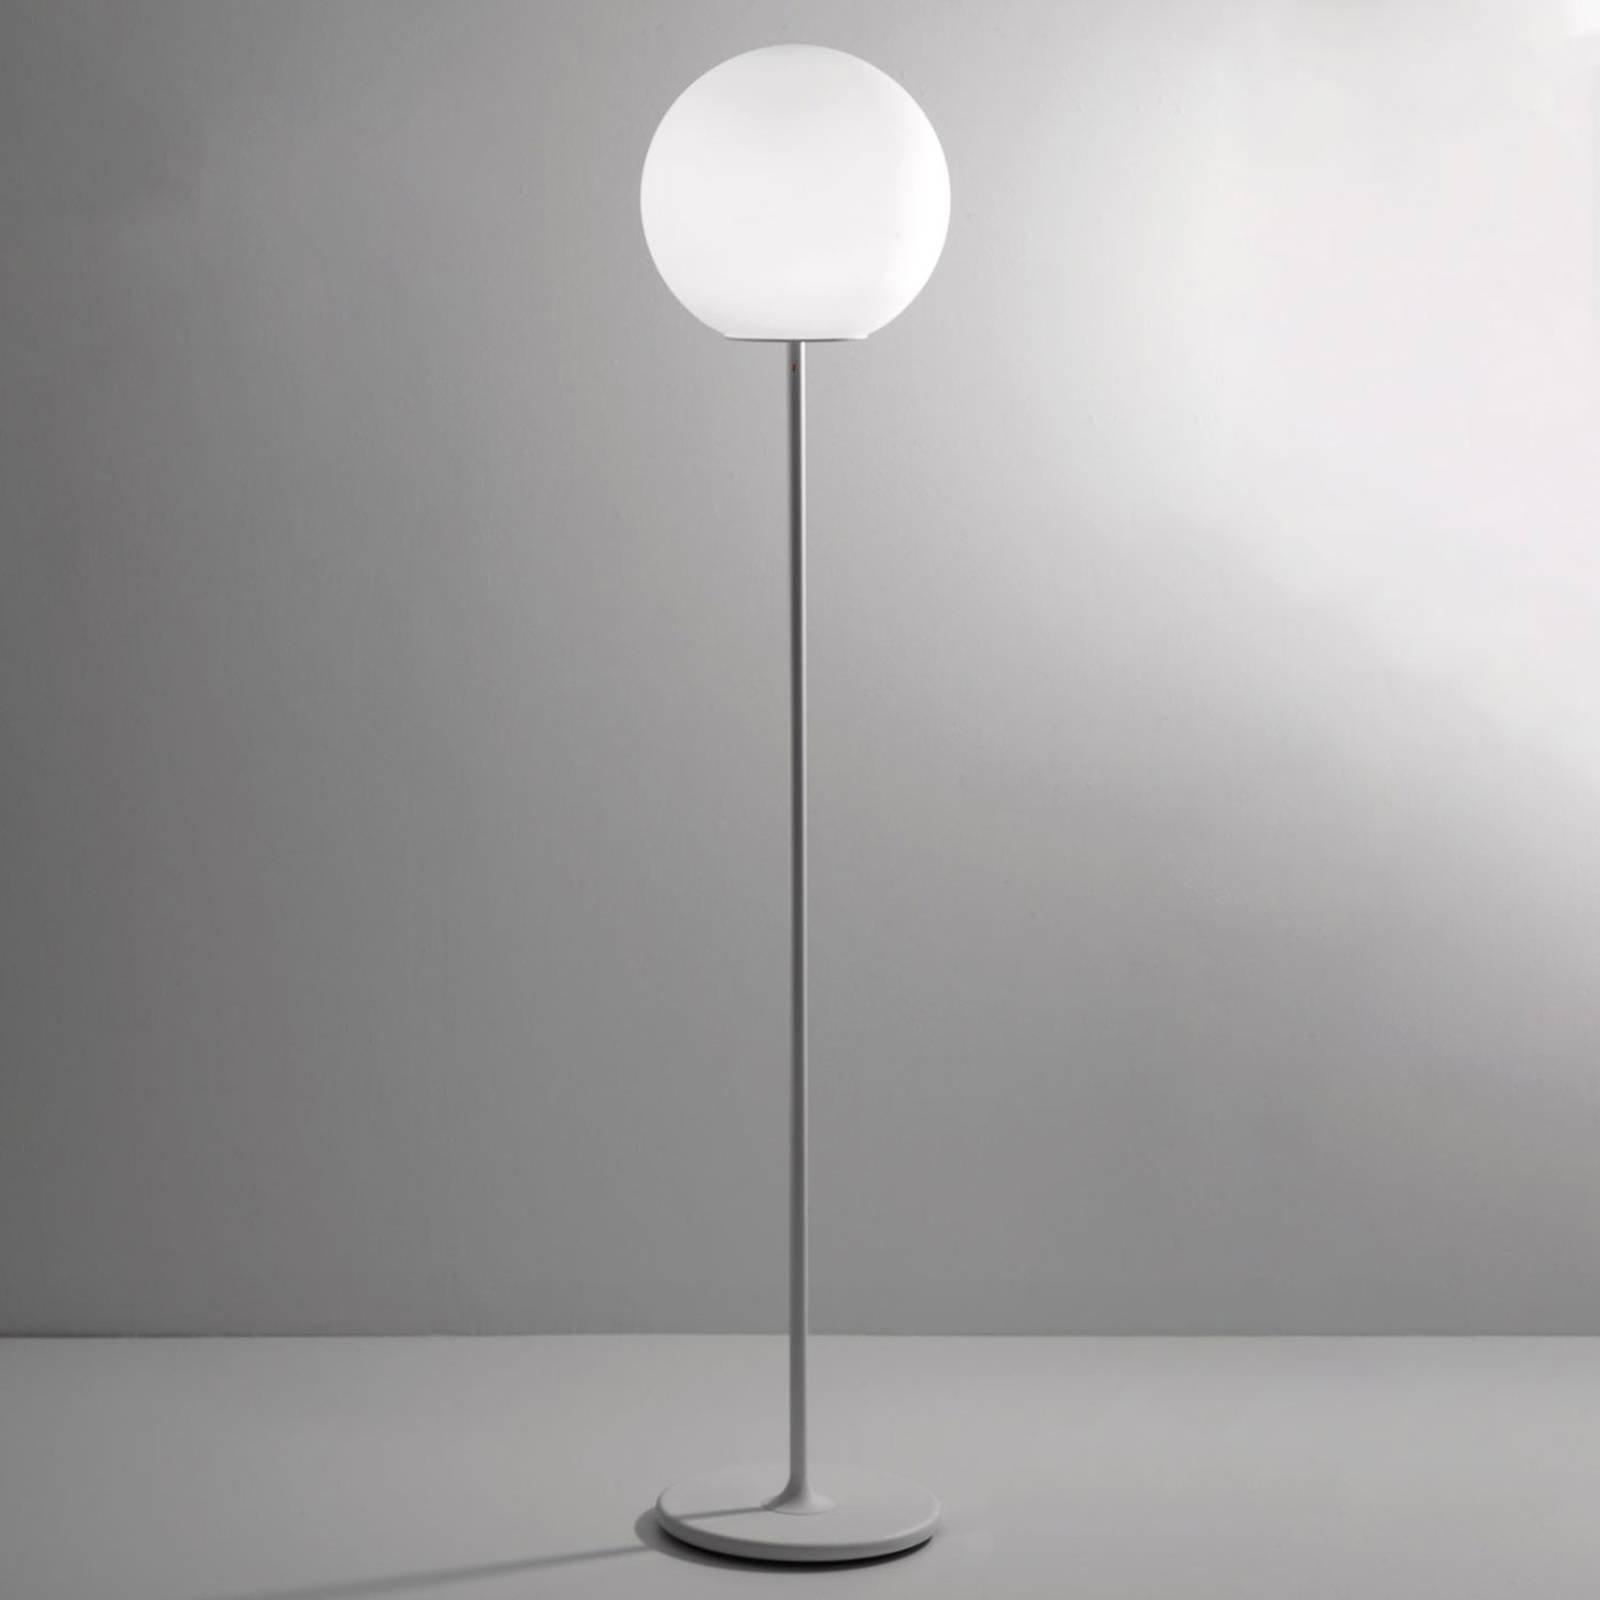 Fabbian Lumi Sfera gulvlampe av glass, Ø 40 cm